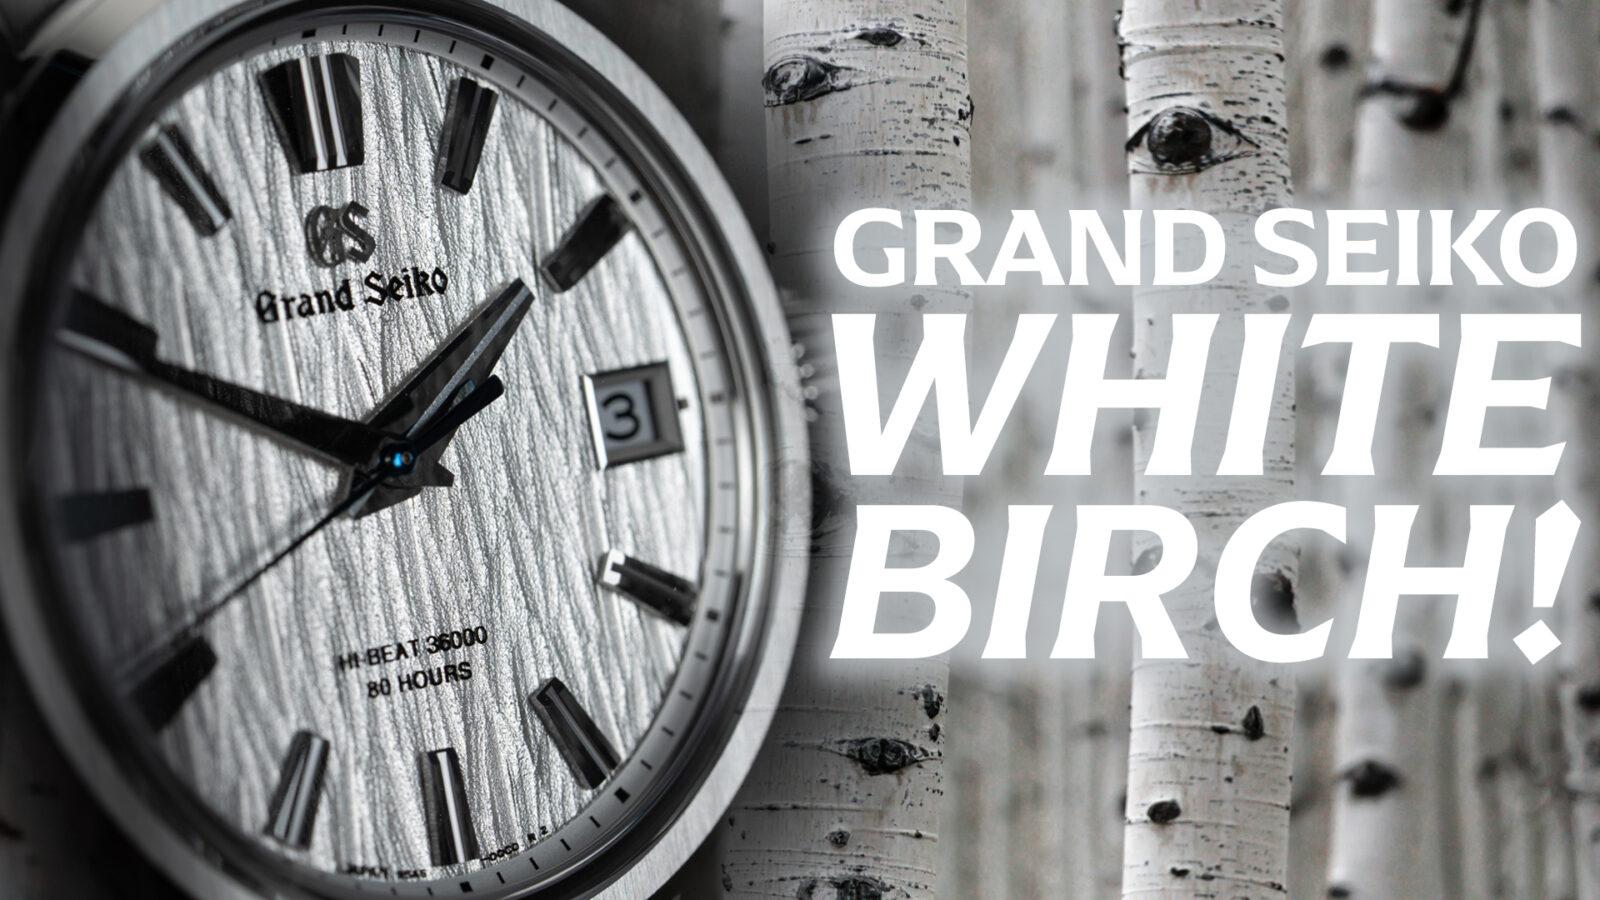 Grand Seiko White Birch